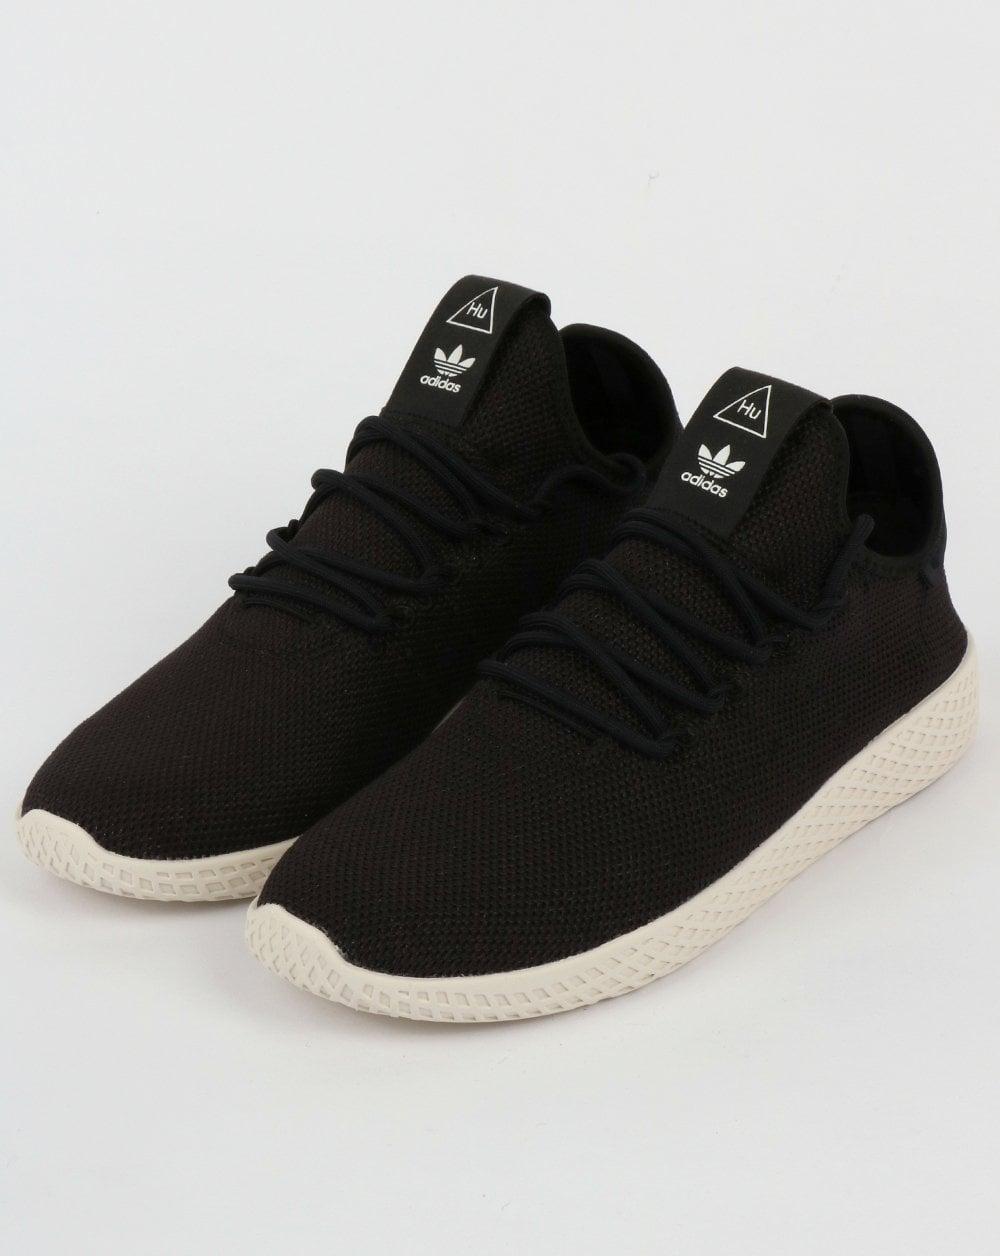 wholesale dealer b79f9 fce4c Adidas PW Tennis HU Trainers Black/Black/White